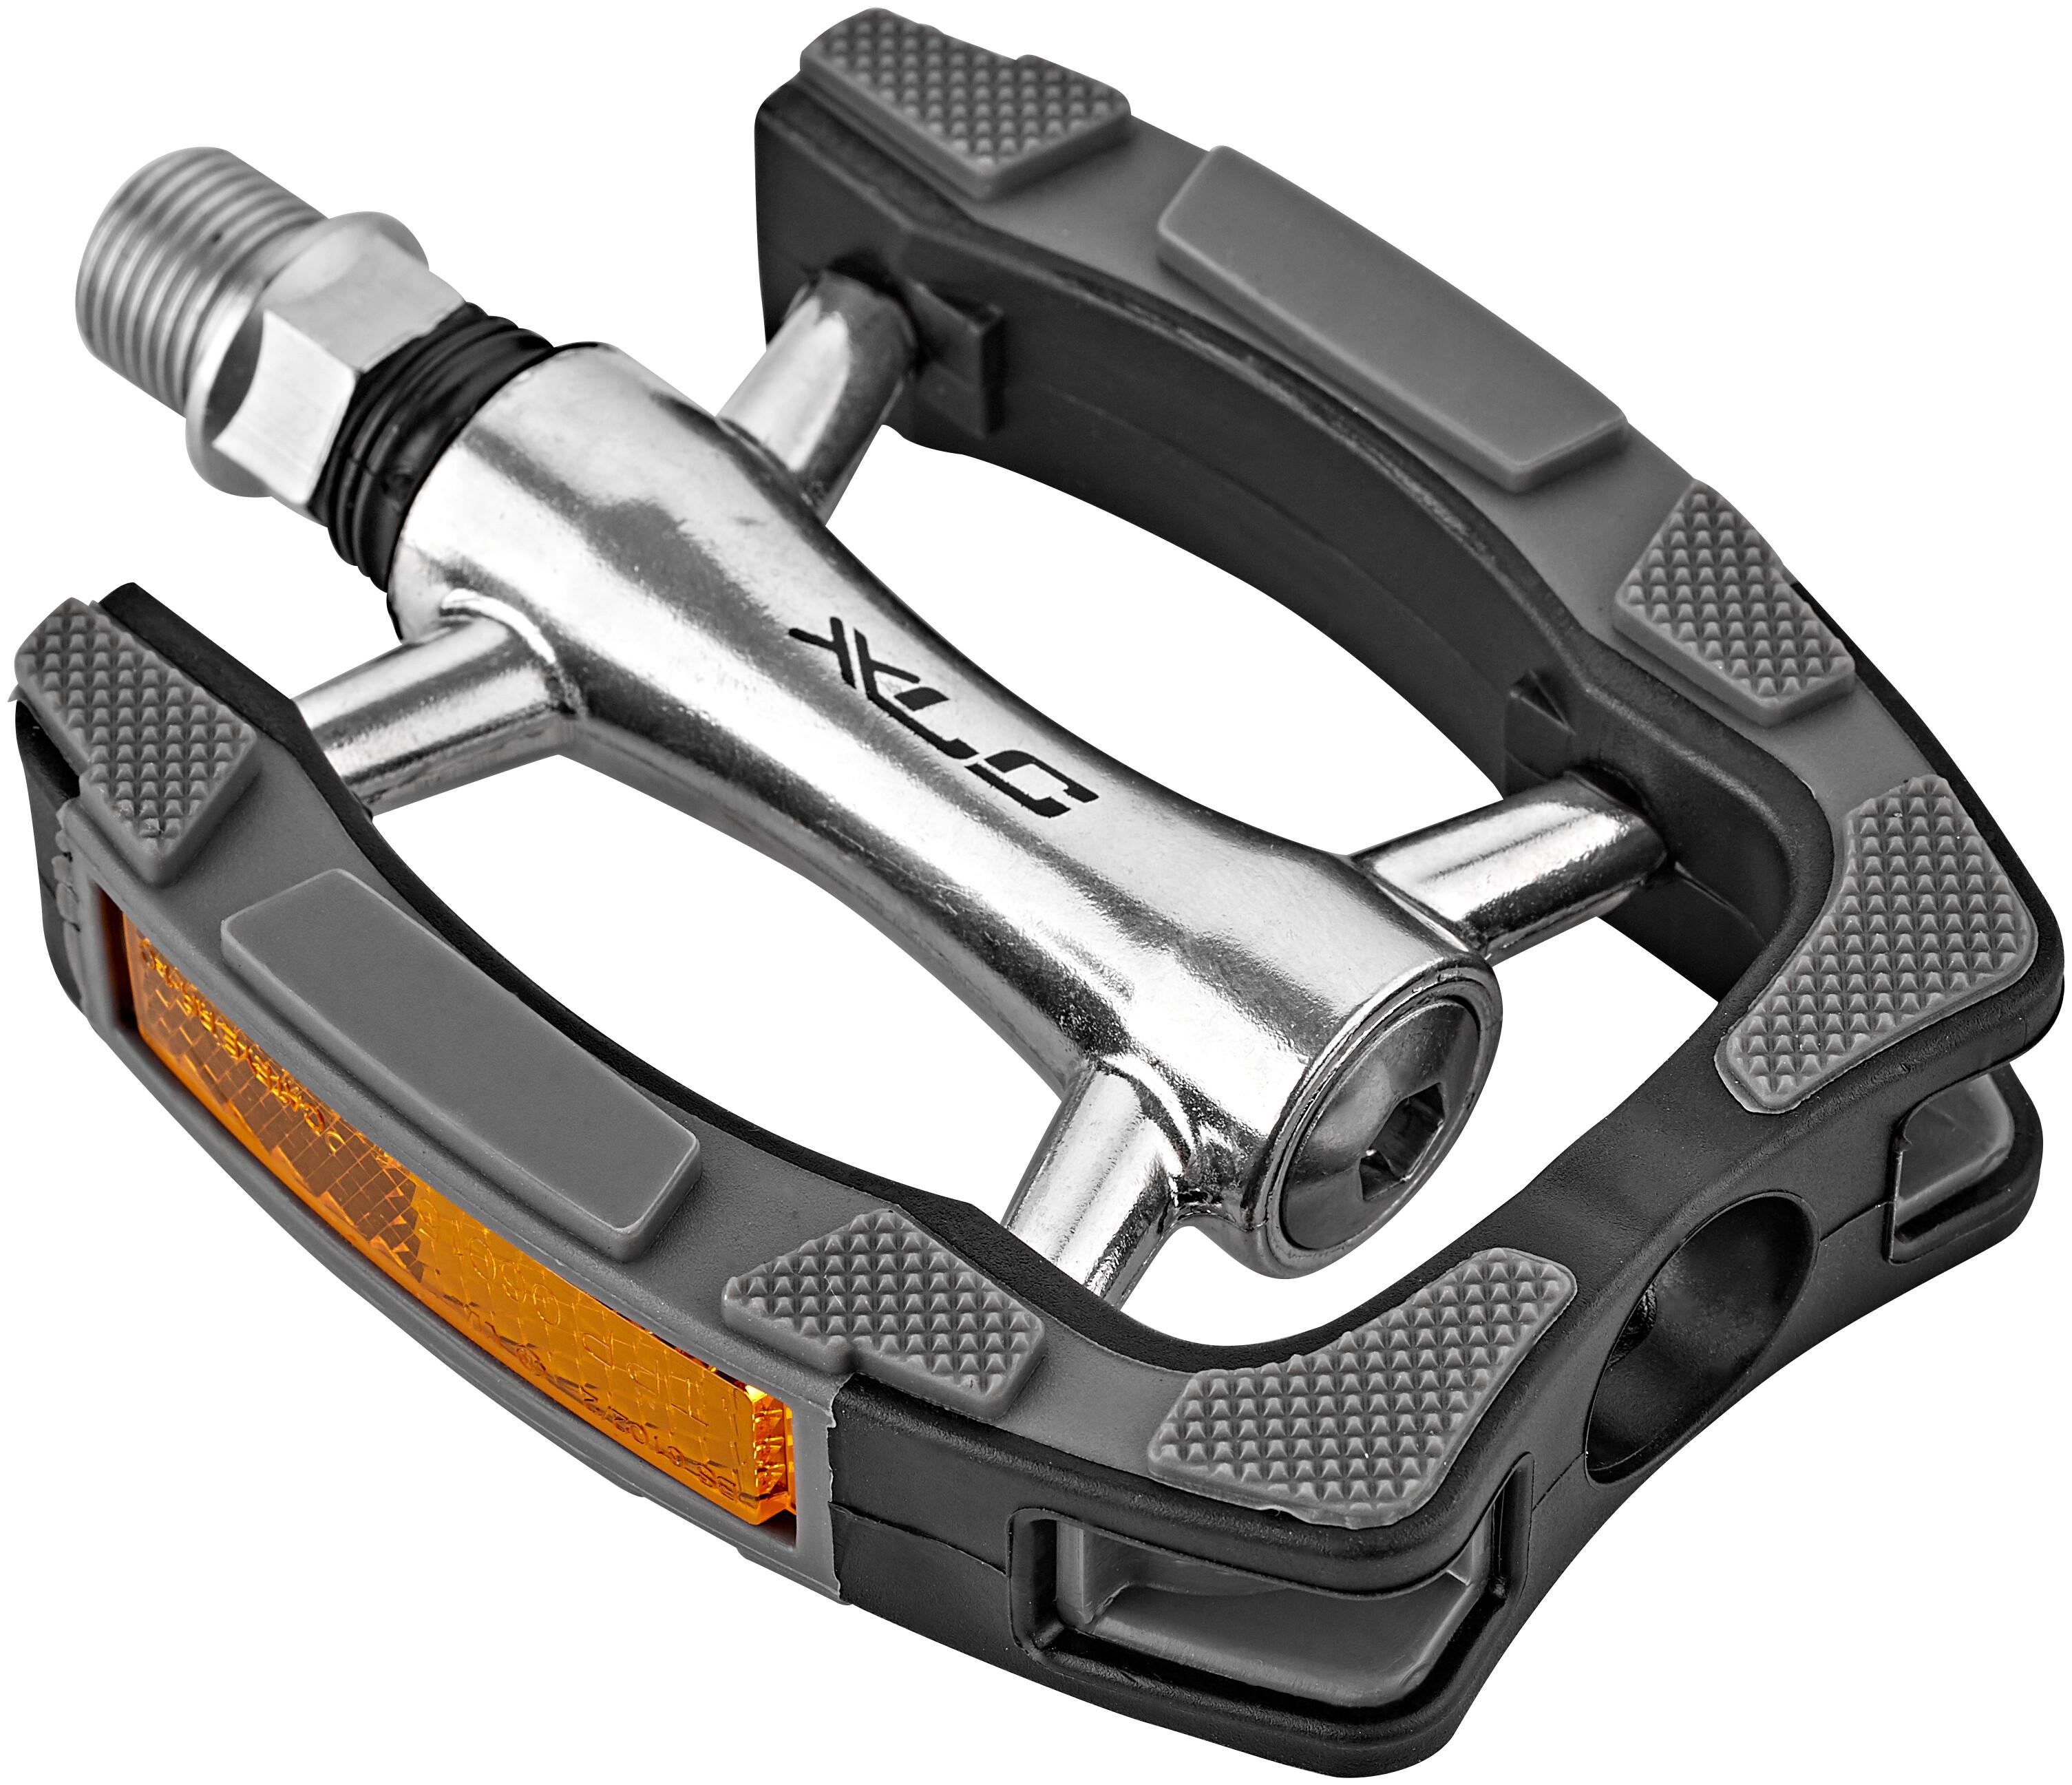 XLC Fahrrad Pedal Fahrradpedal Pedale City Comfort PD-C14 Alu schw silbergrau